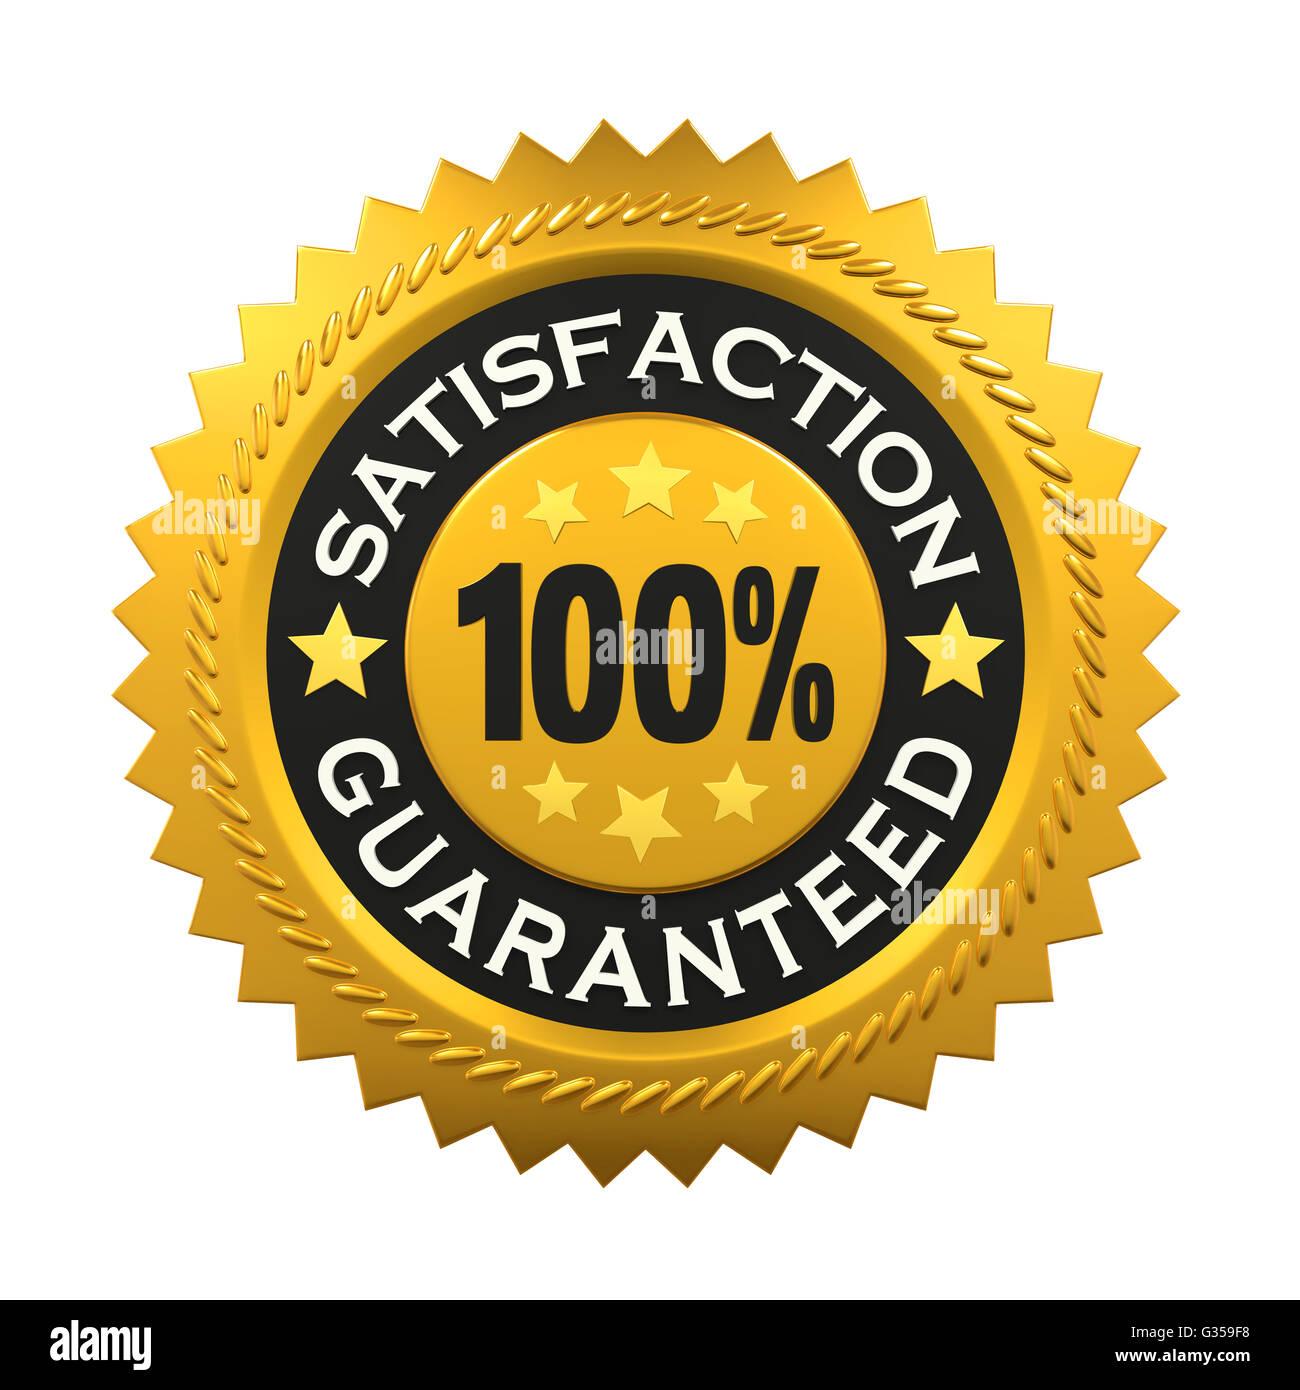 Satisfaction Guaranteed Label - Stock Image